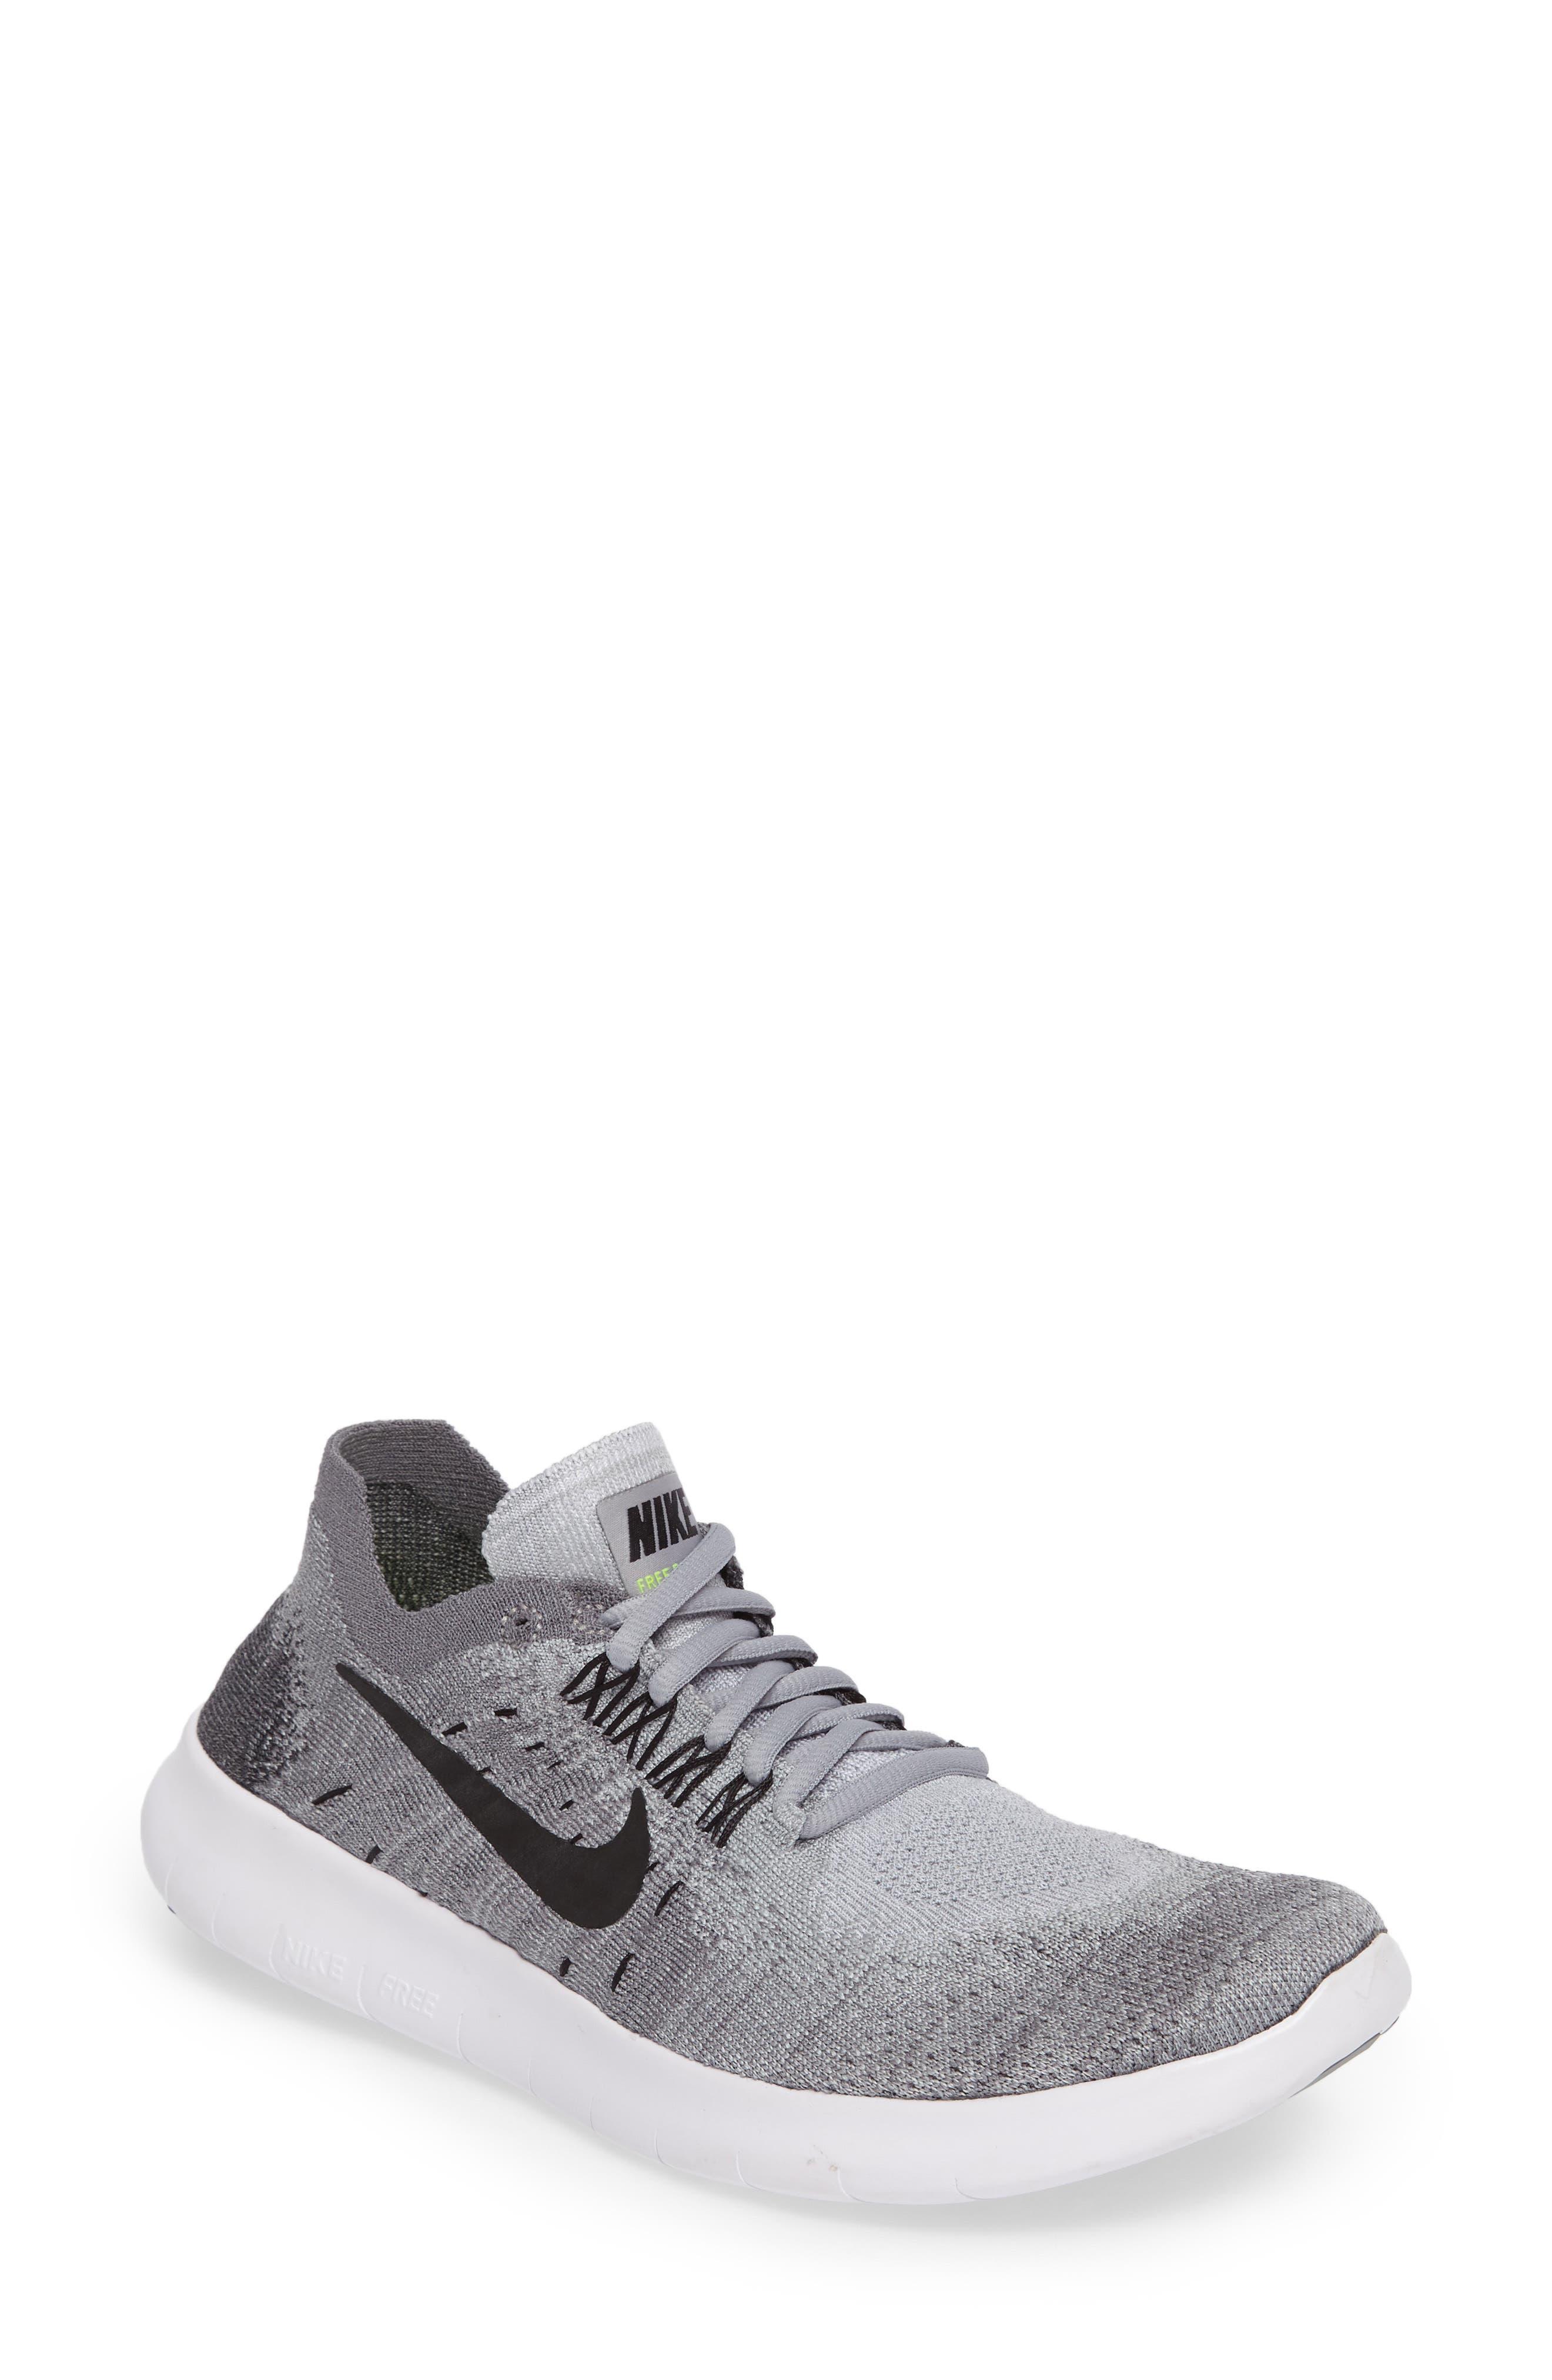 Free RN Flyknit 2 Running Shoe,                             Main thumbnail 1, color,                             020